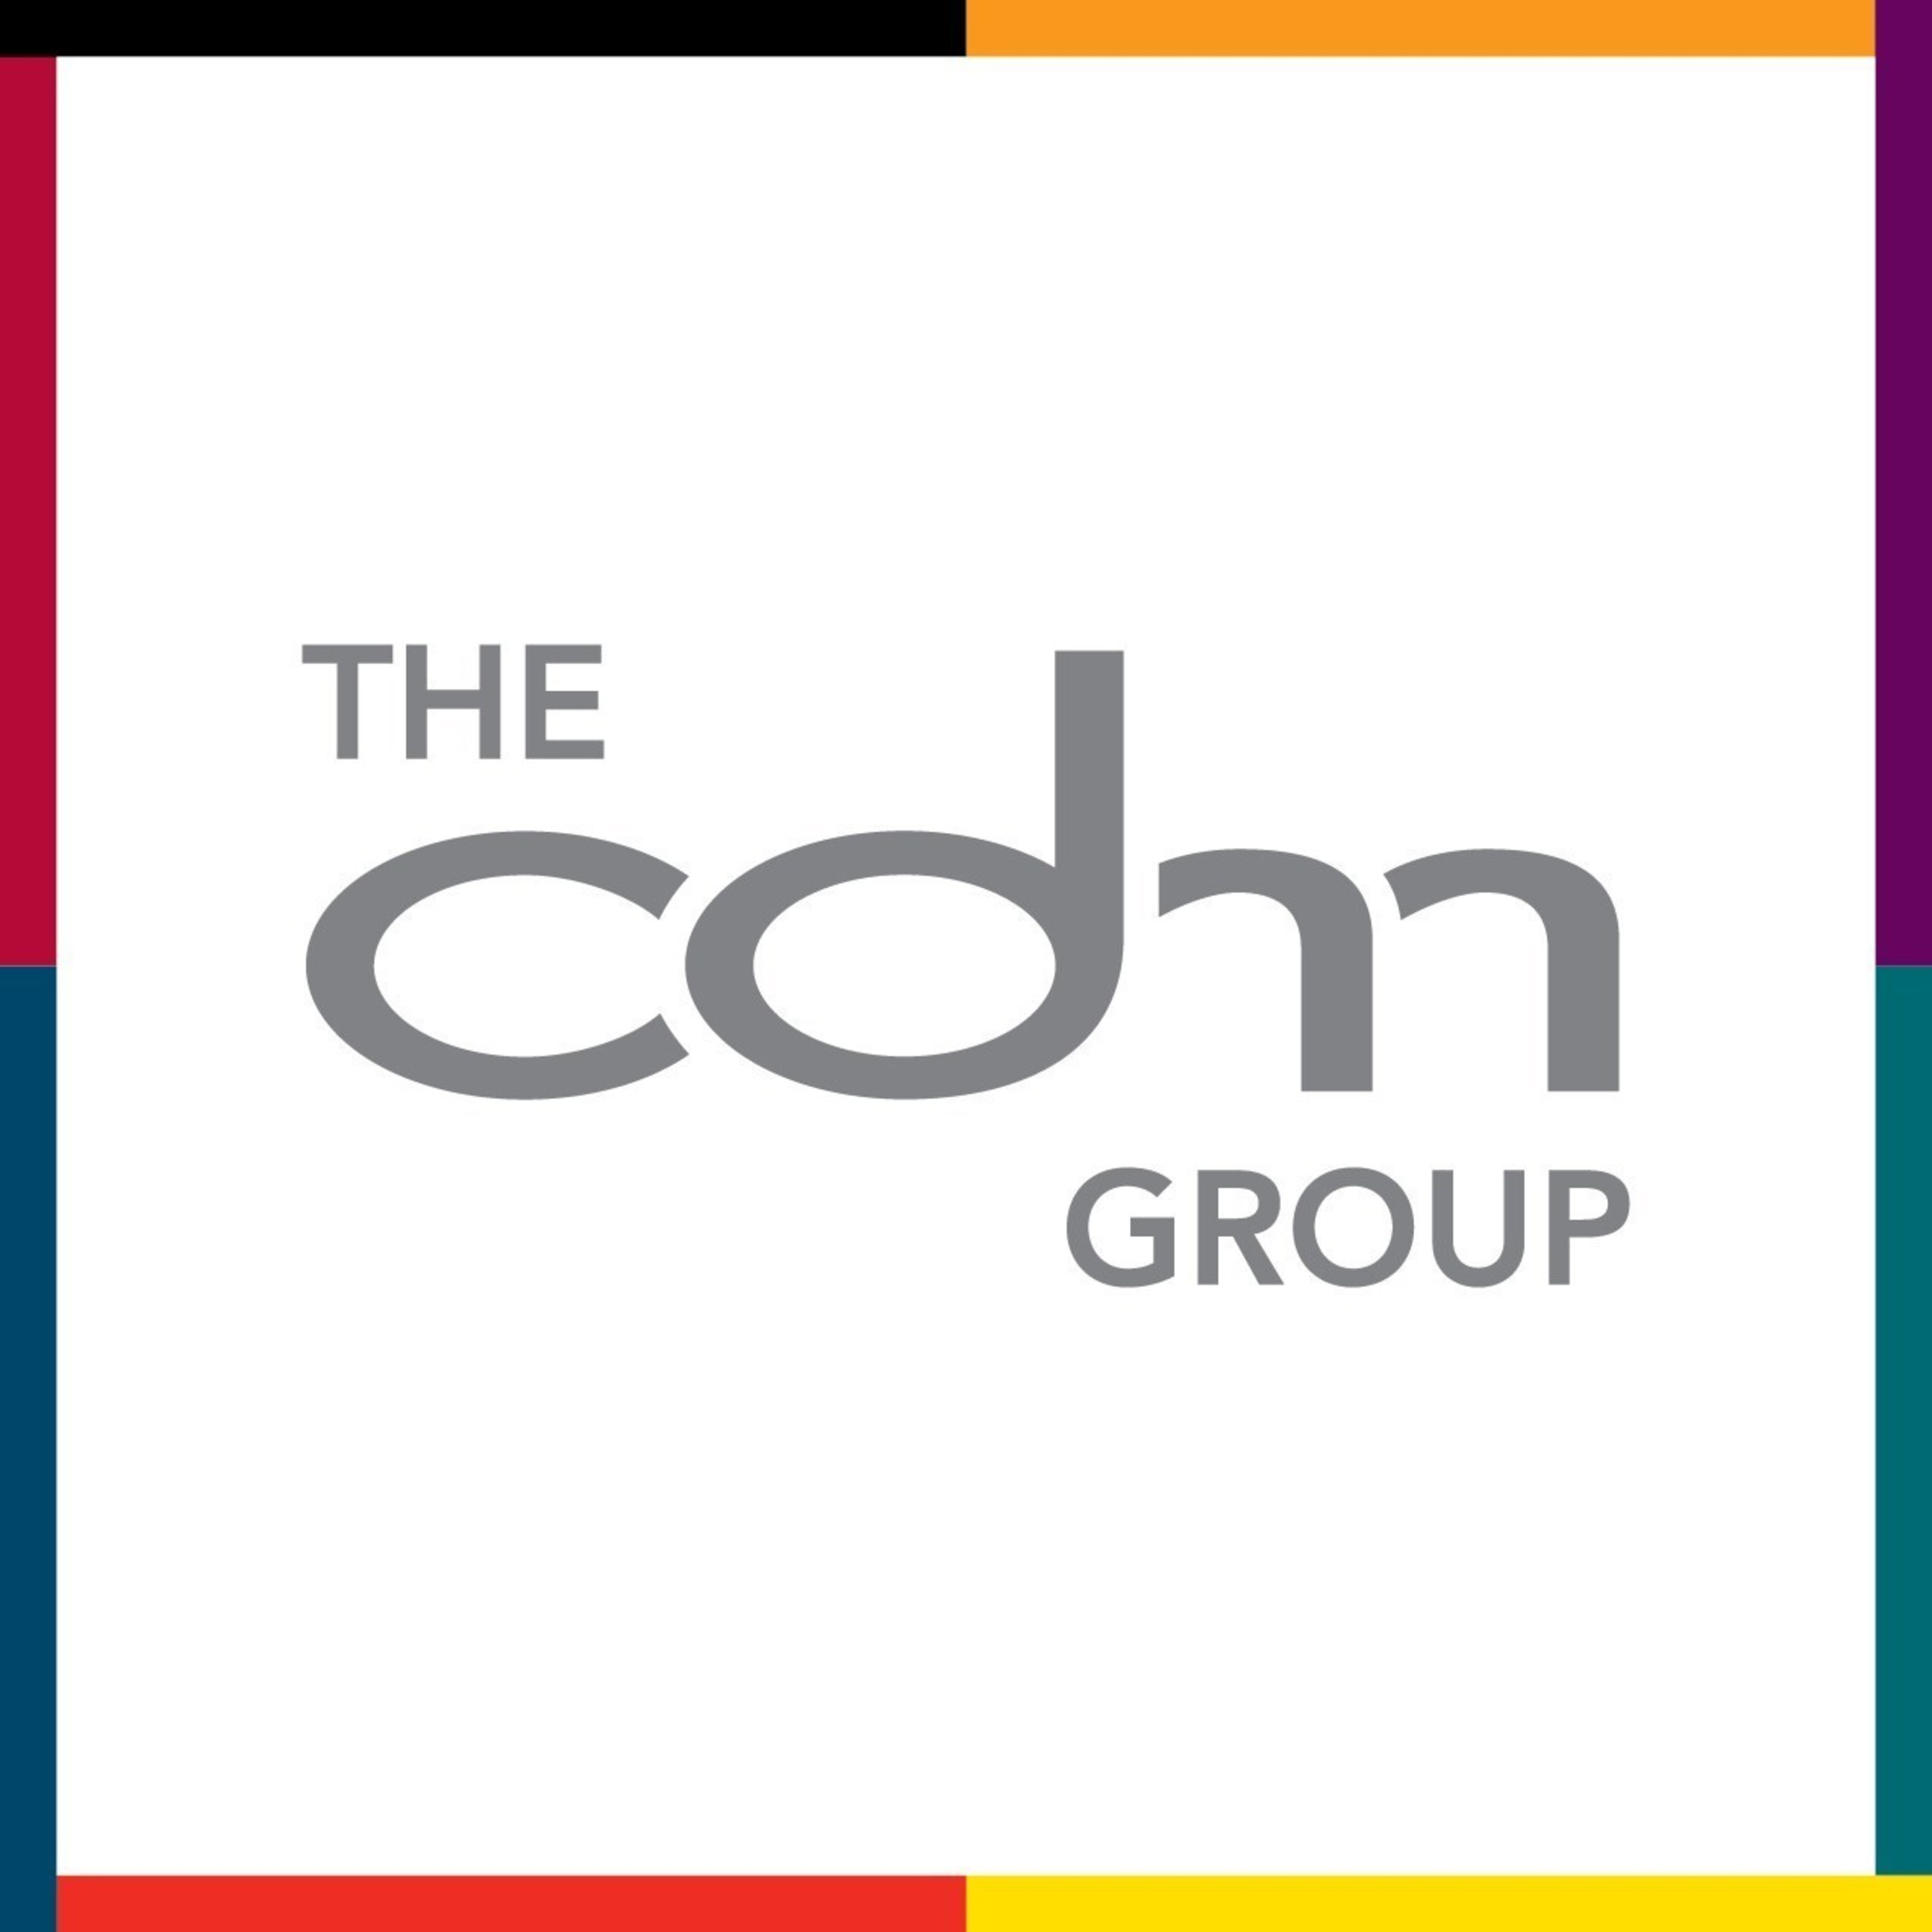 The CDM Group logo